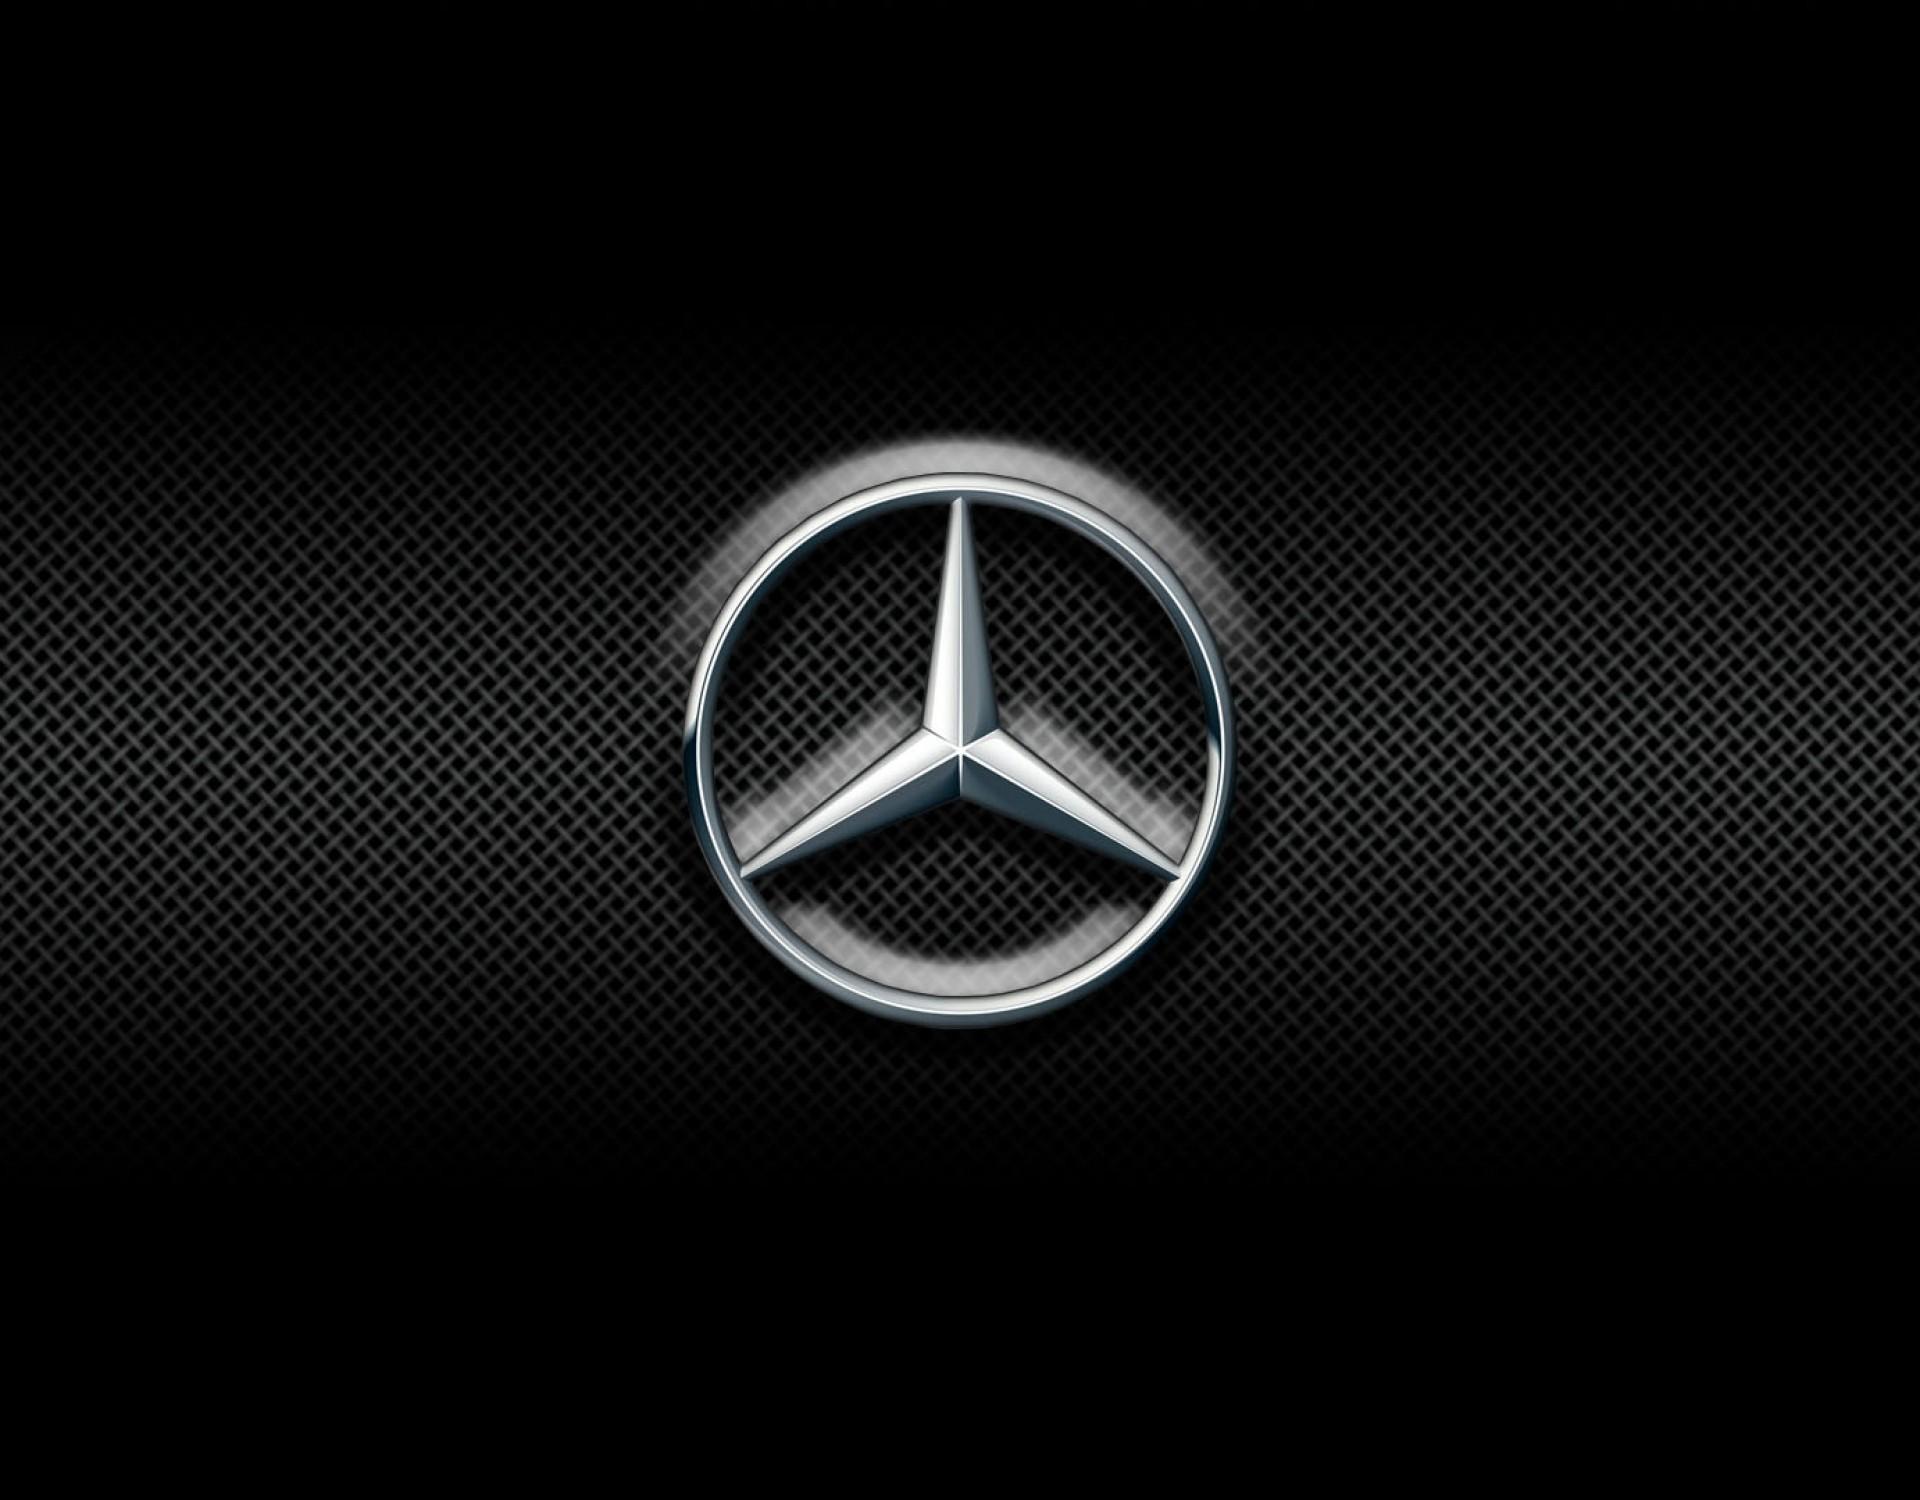 Mercedes Logo Wallpapers: Find best latest Mercedes Logo Wallpapers in HD  for your PC desktop